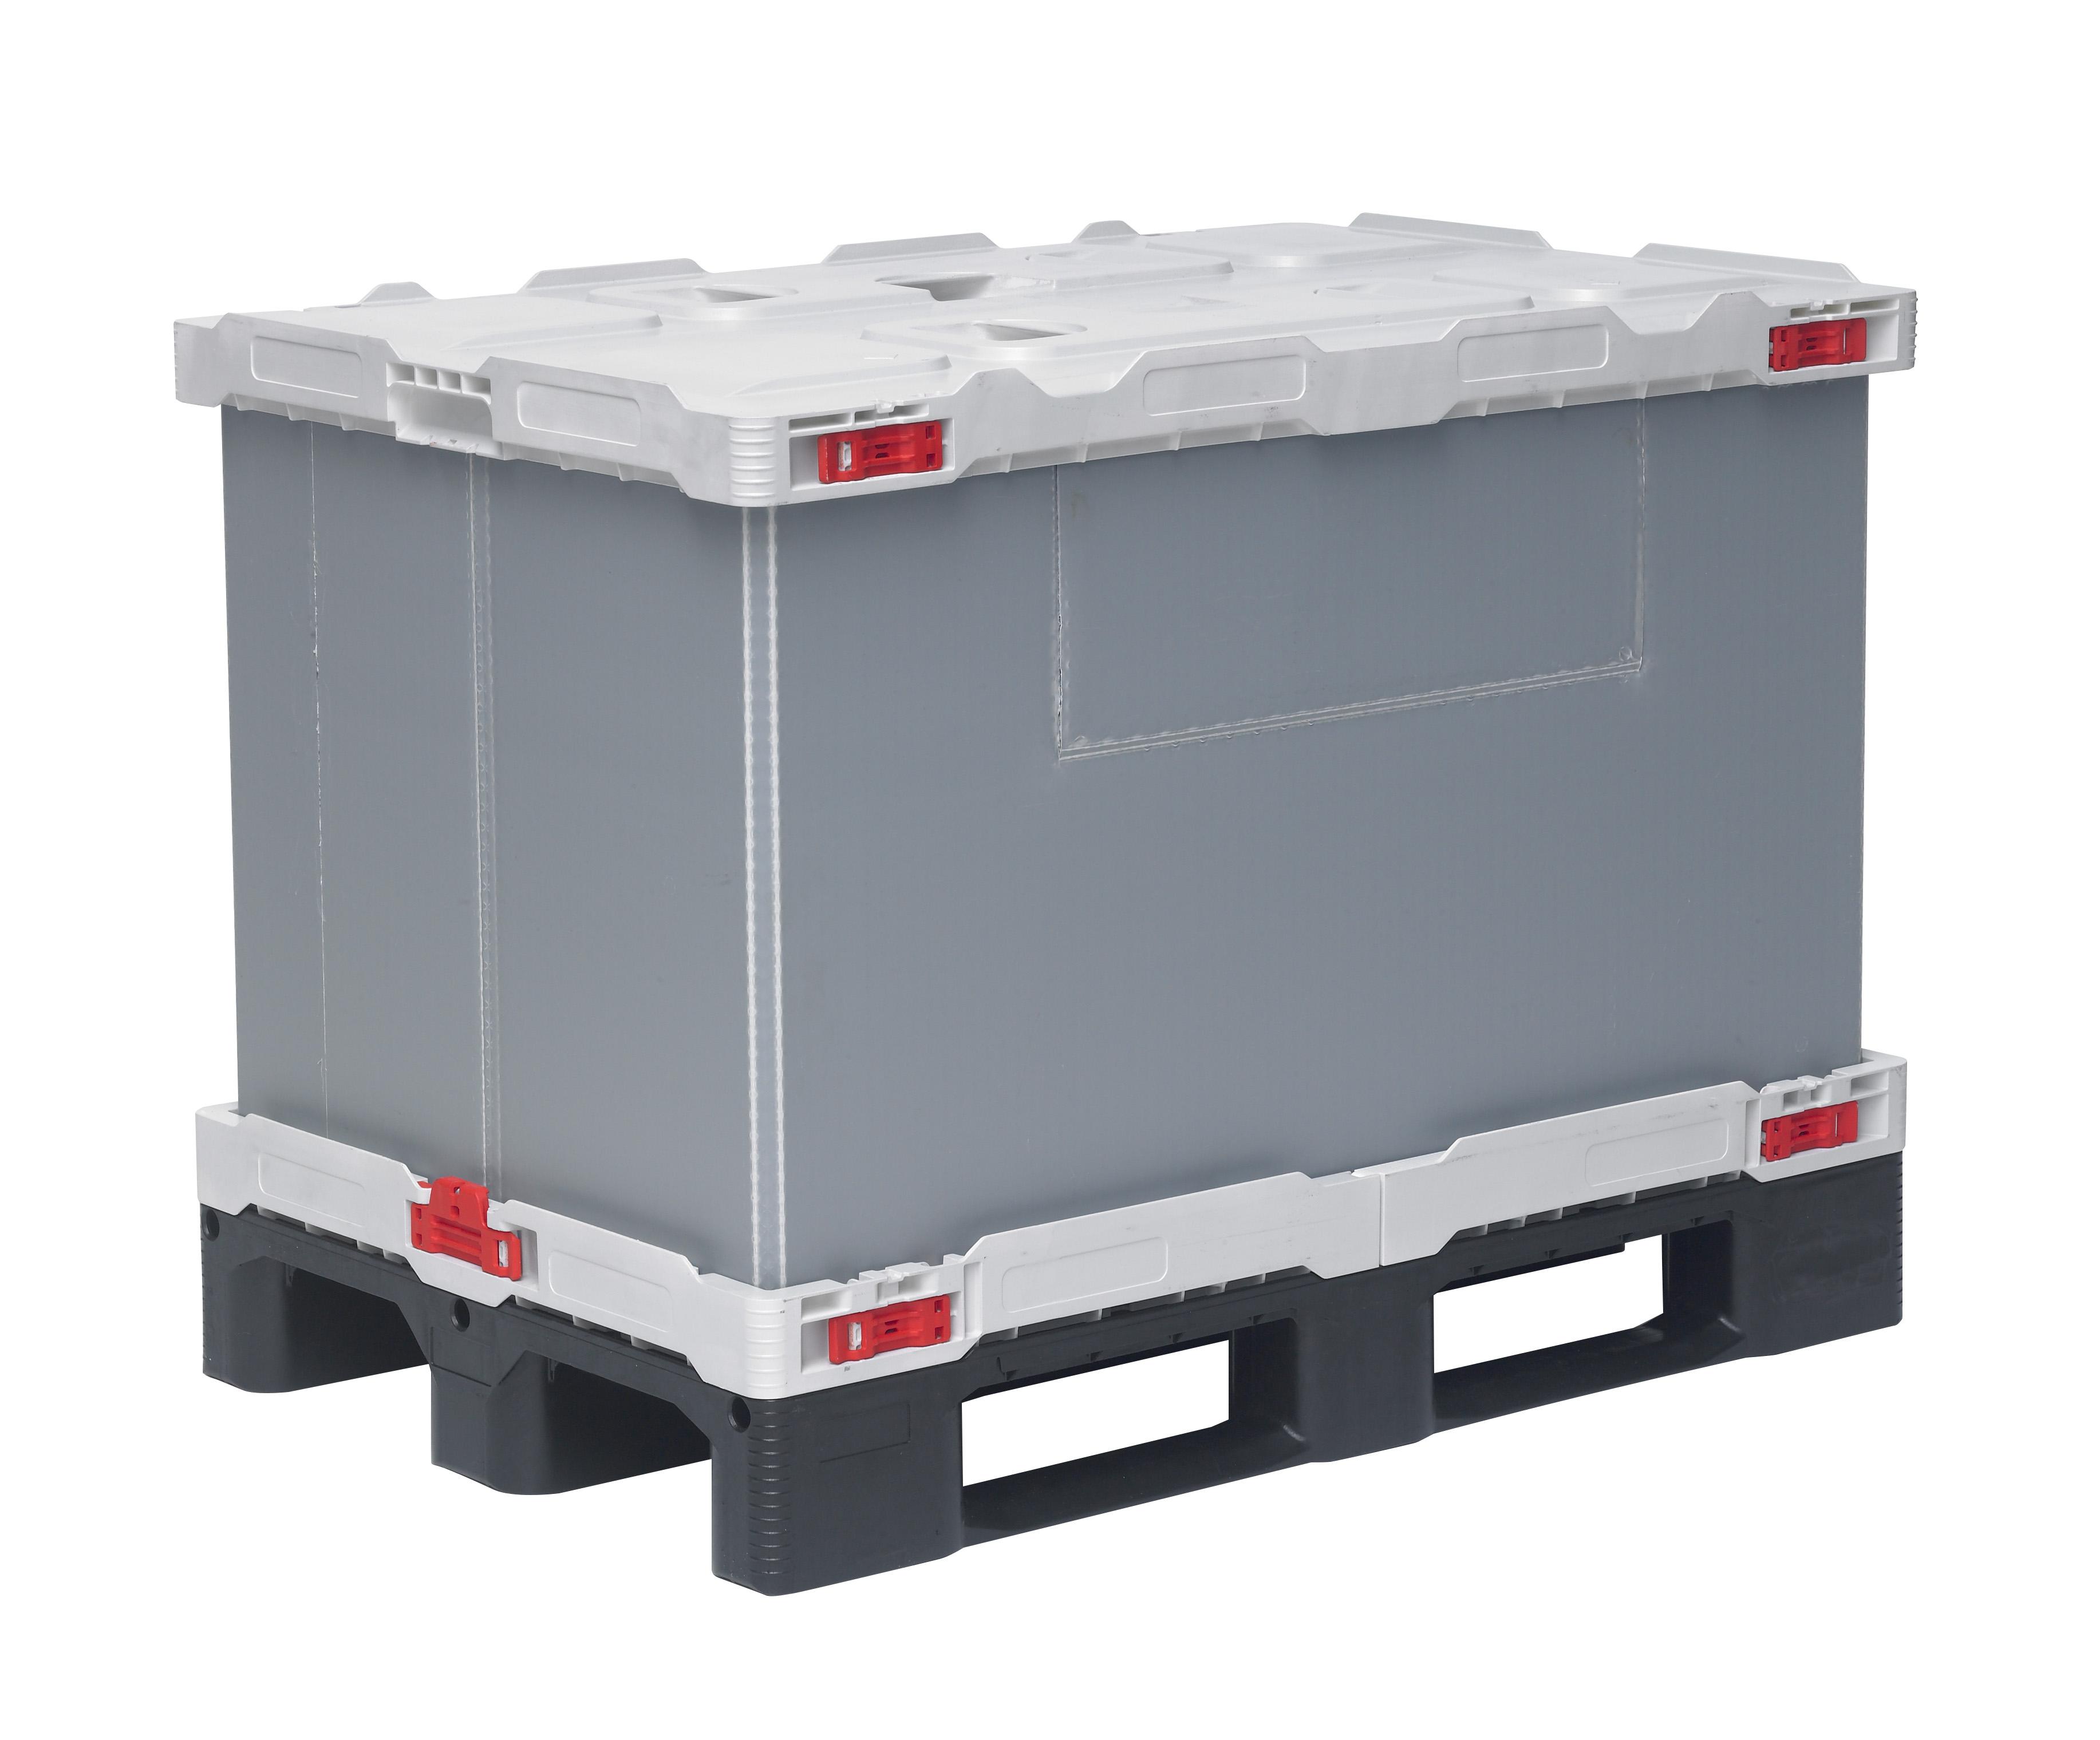 Goplasticpallets.com Launch New Multi-Trip Box